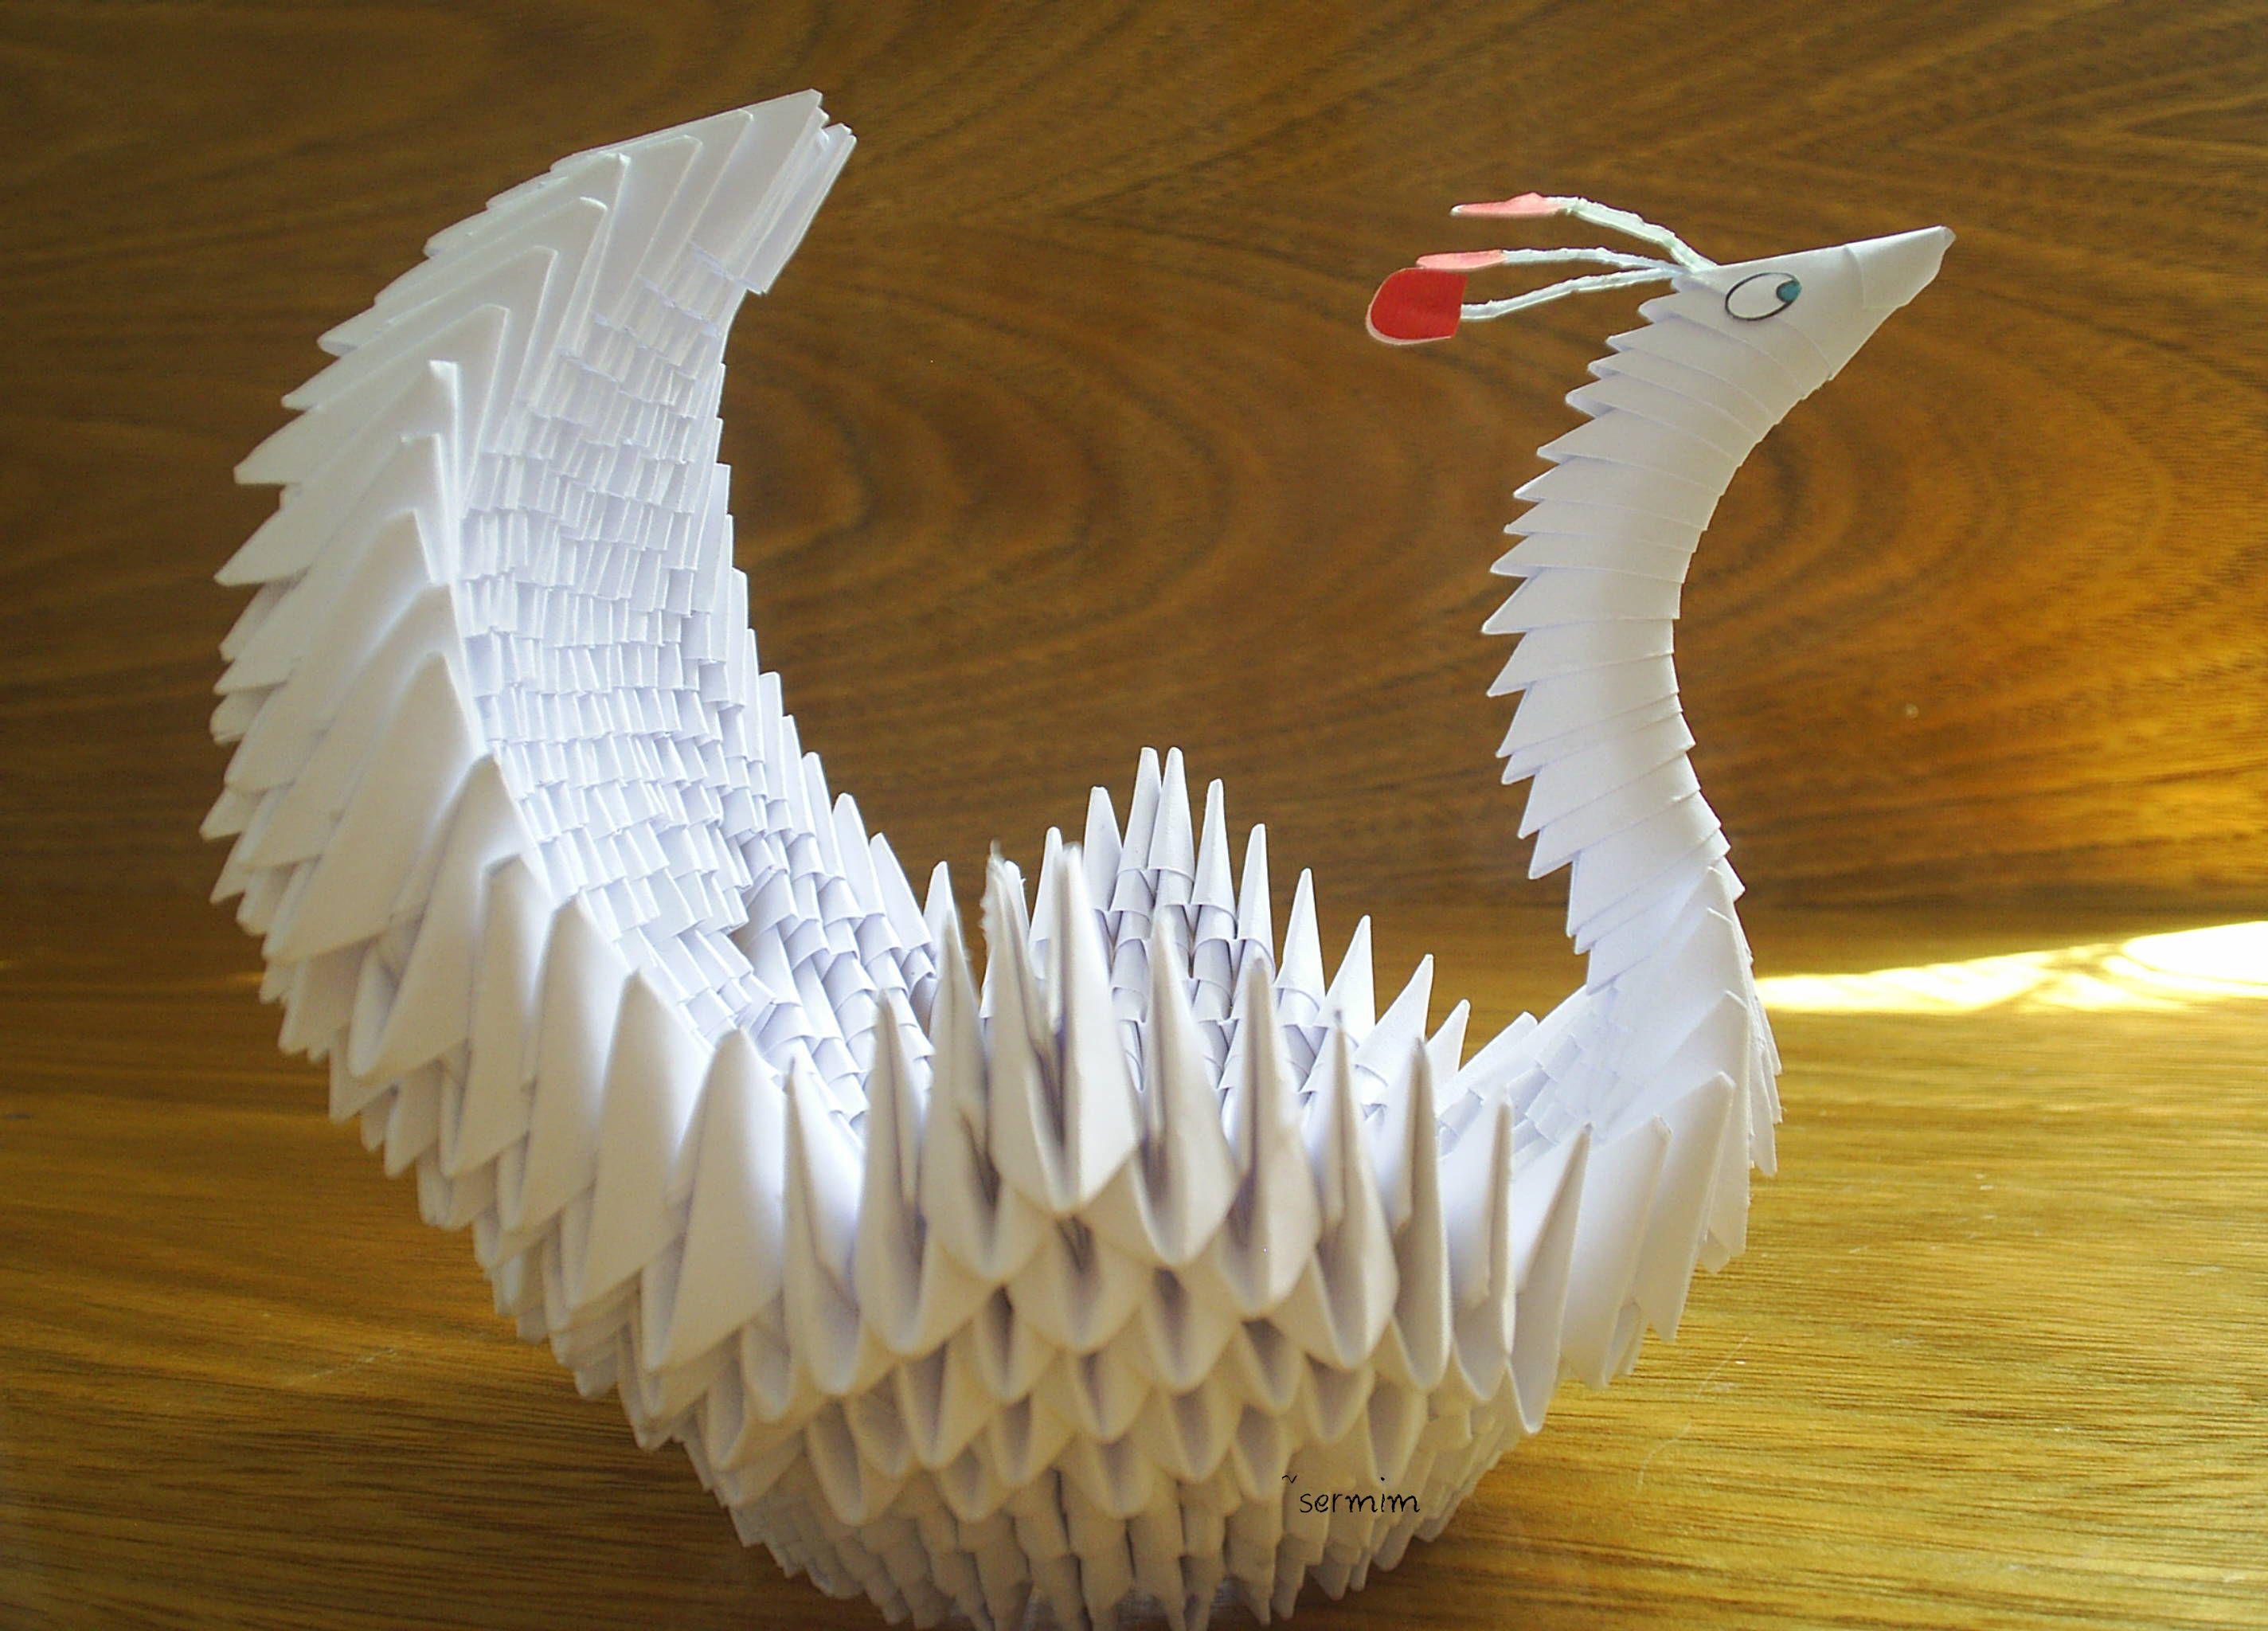 paper folding swan | paper art | Pinterest | Paper folding and Craft